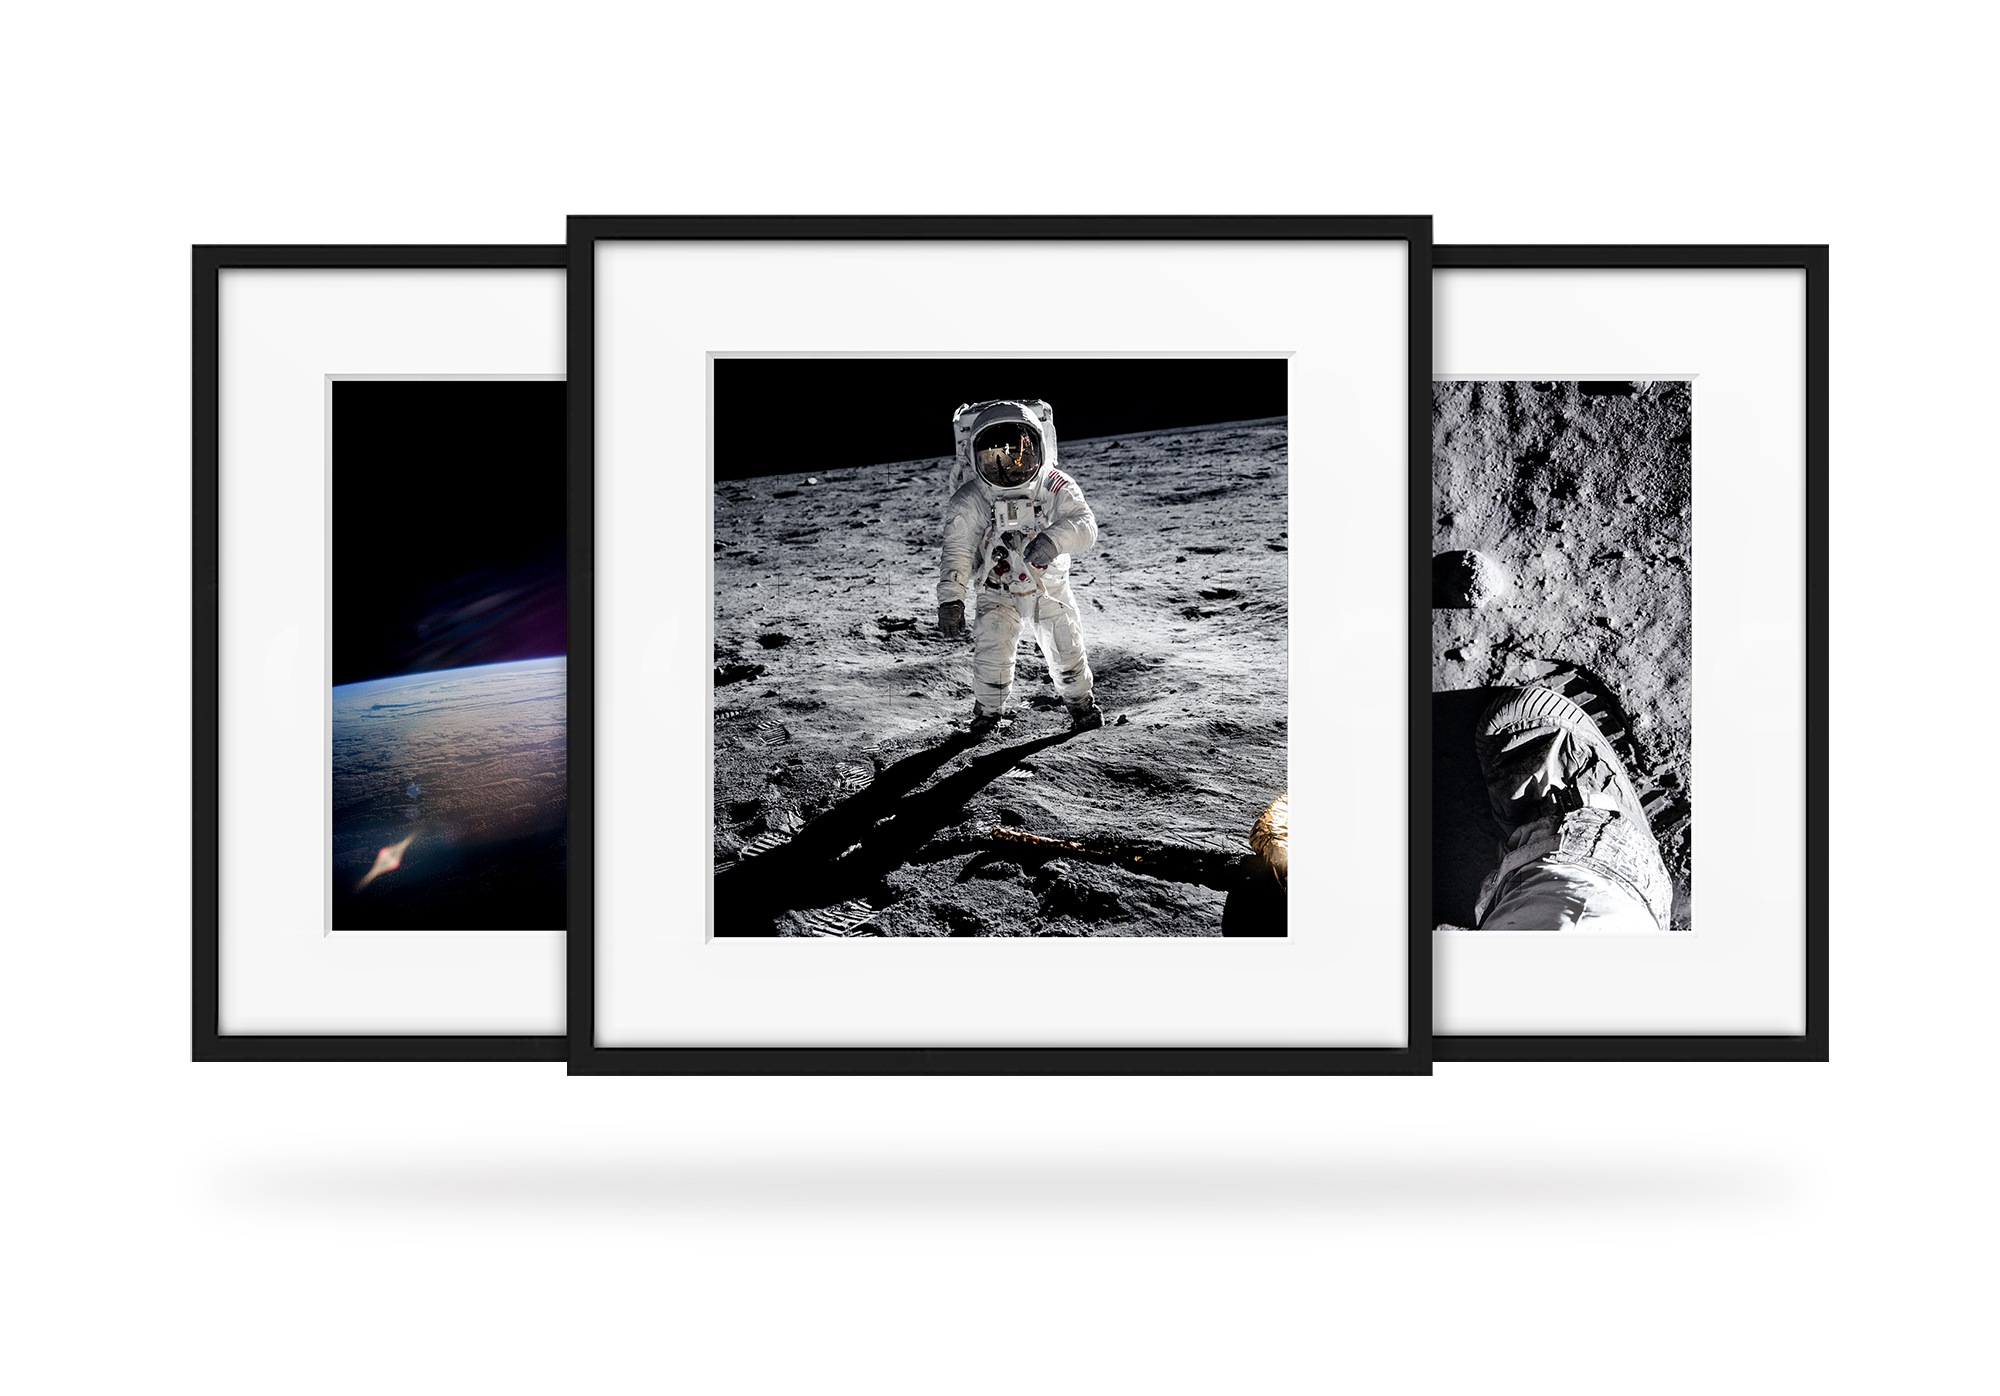 3 x frame.jpg